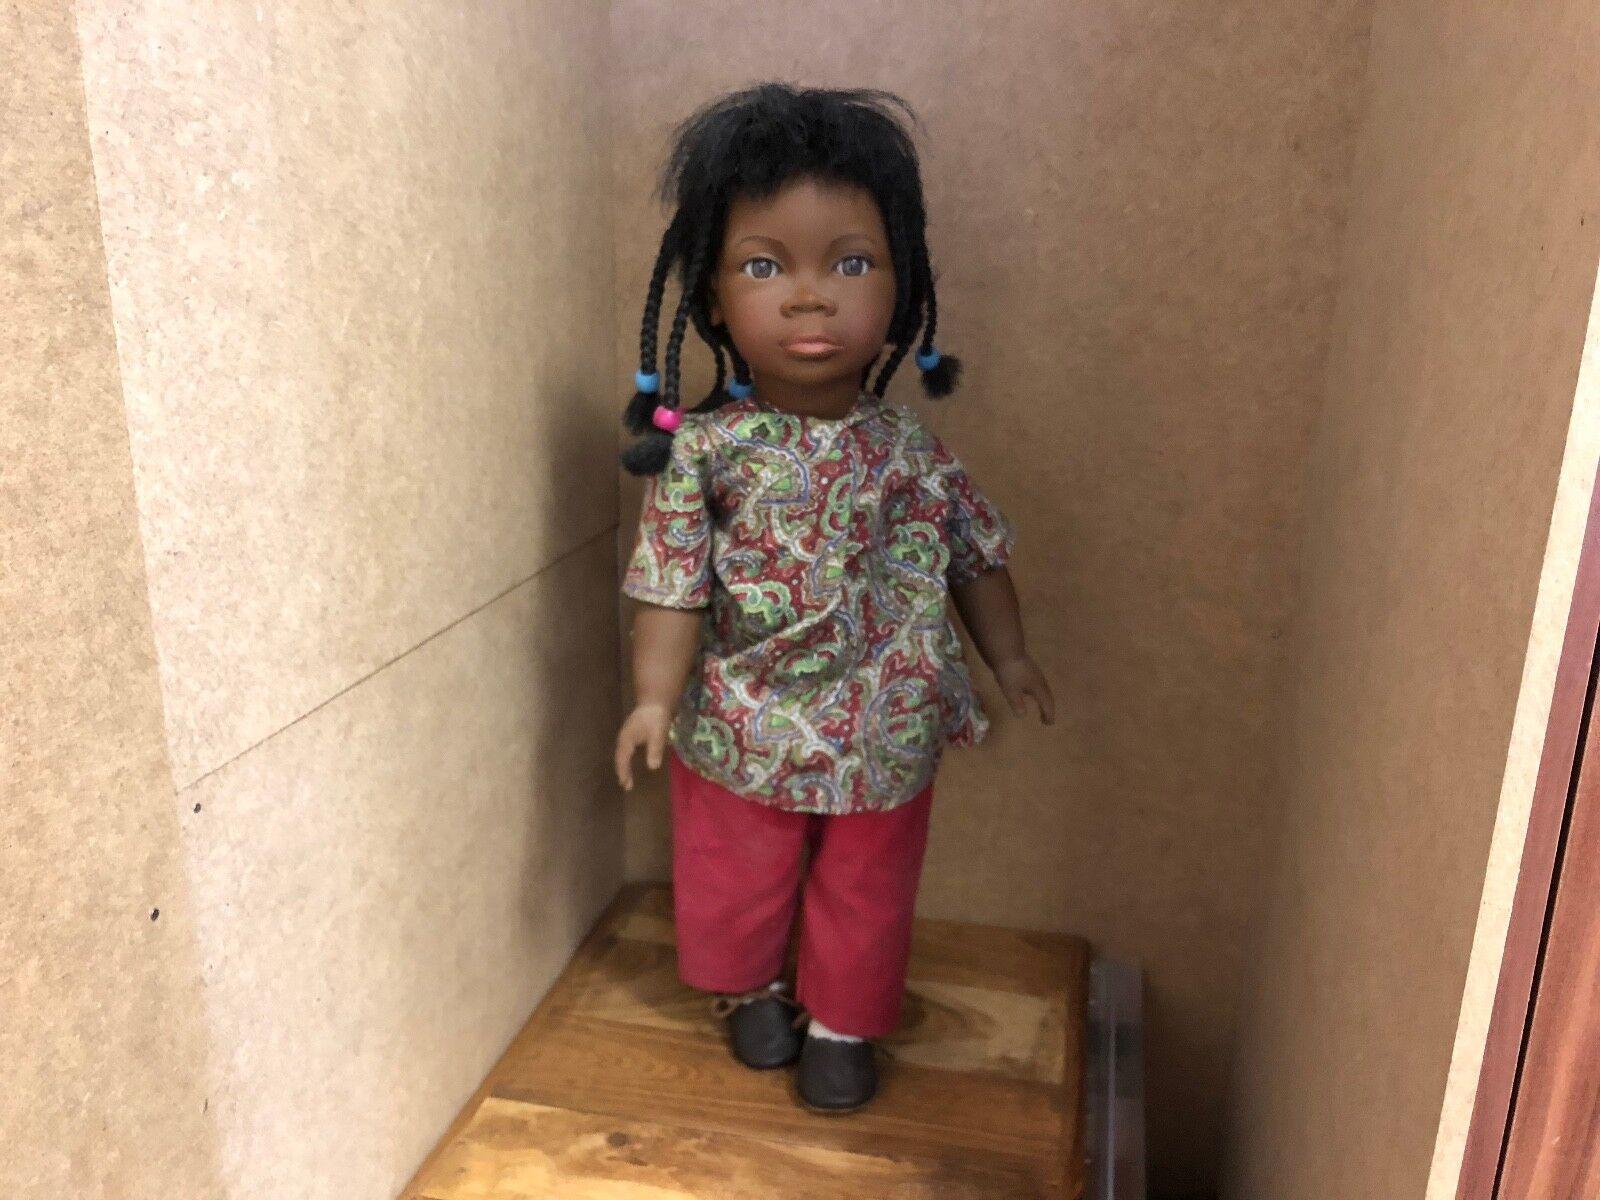 Pamela Erff Vinyl Puppe 55 Cm Dolls Top Zustand Dolls & Bears